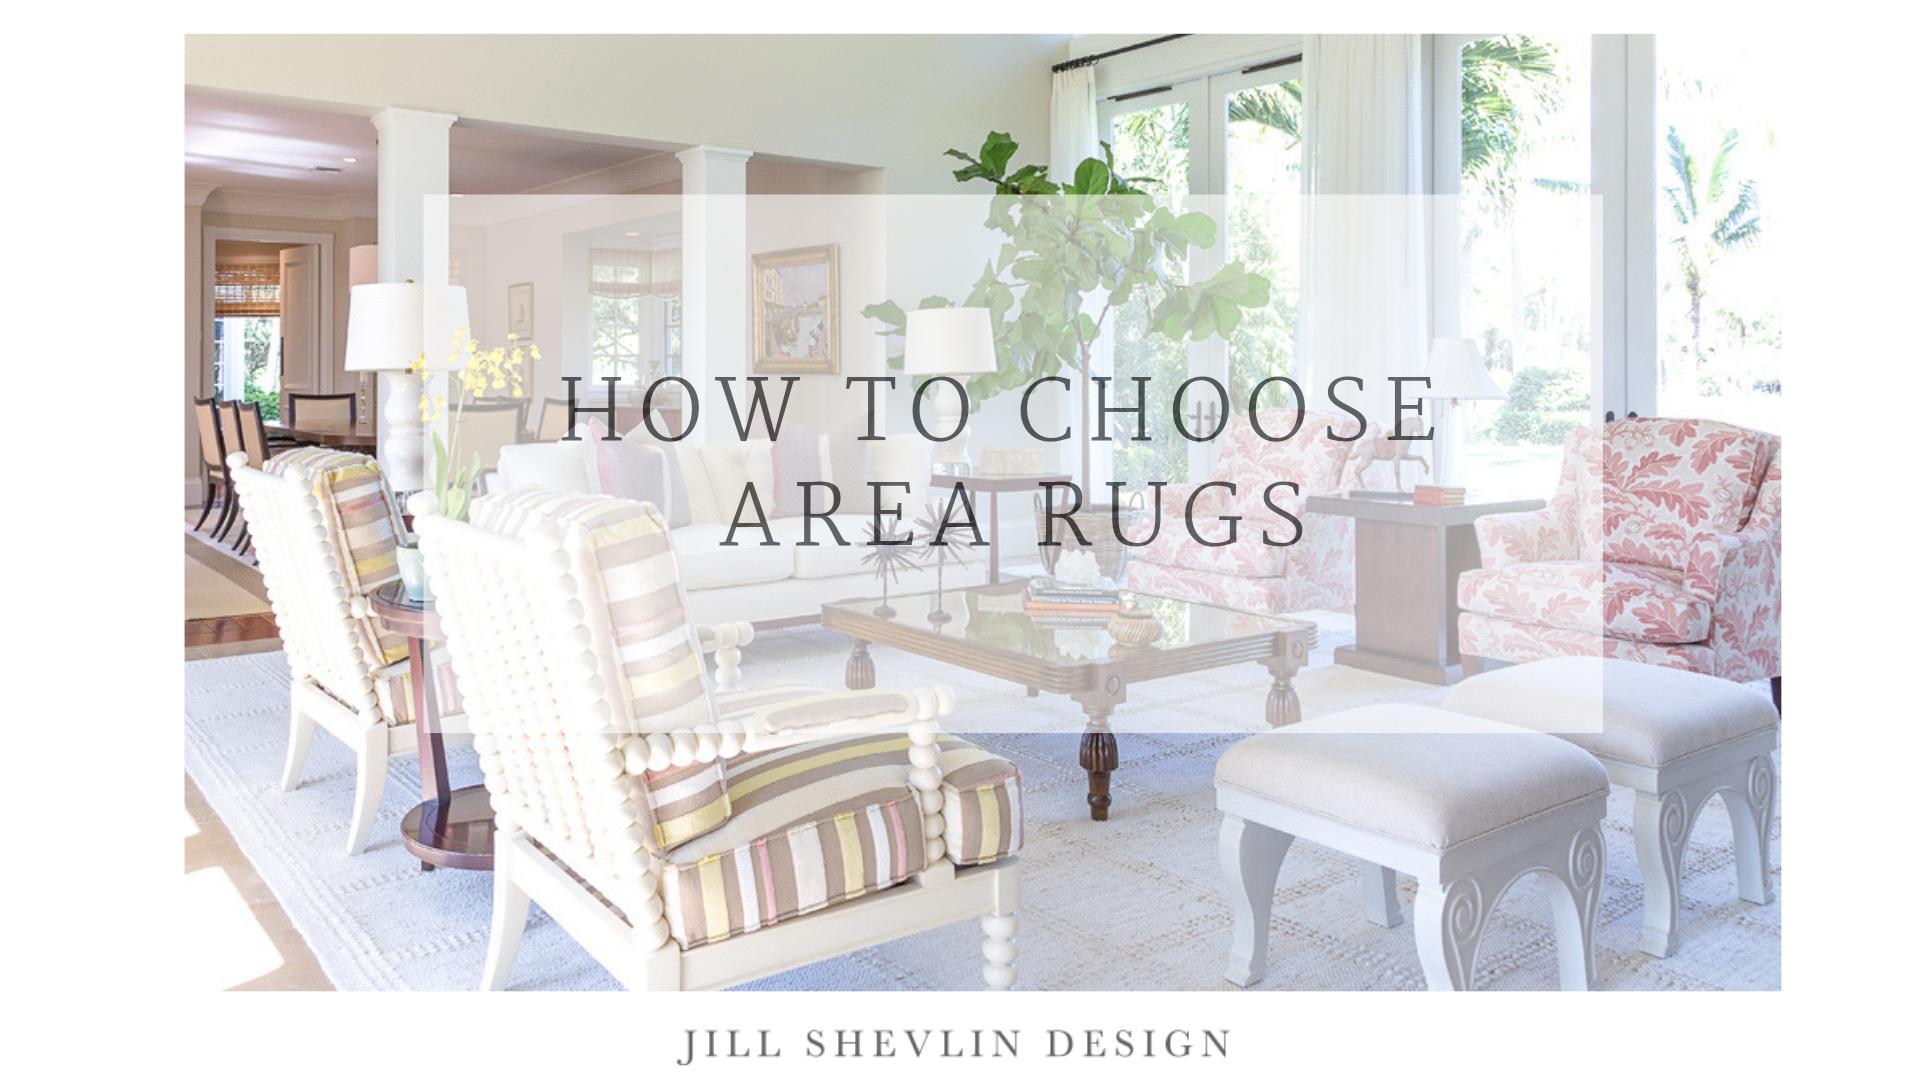 Cotton & Jute How to Choose and Area Rug Shevlin Design Vero Beach Interior Designer, Vero Beach Decor, Vero Beach Furniture